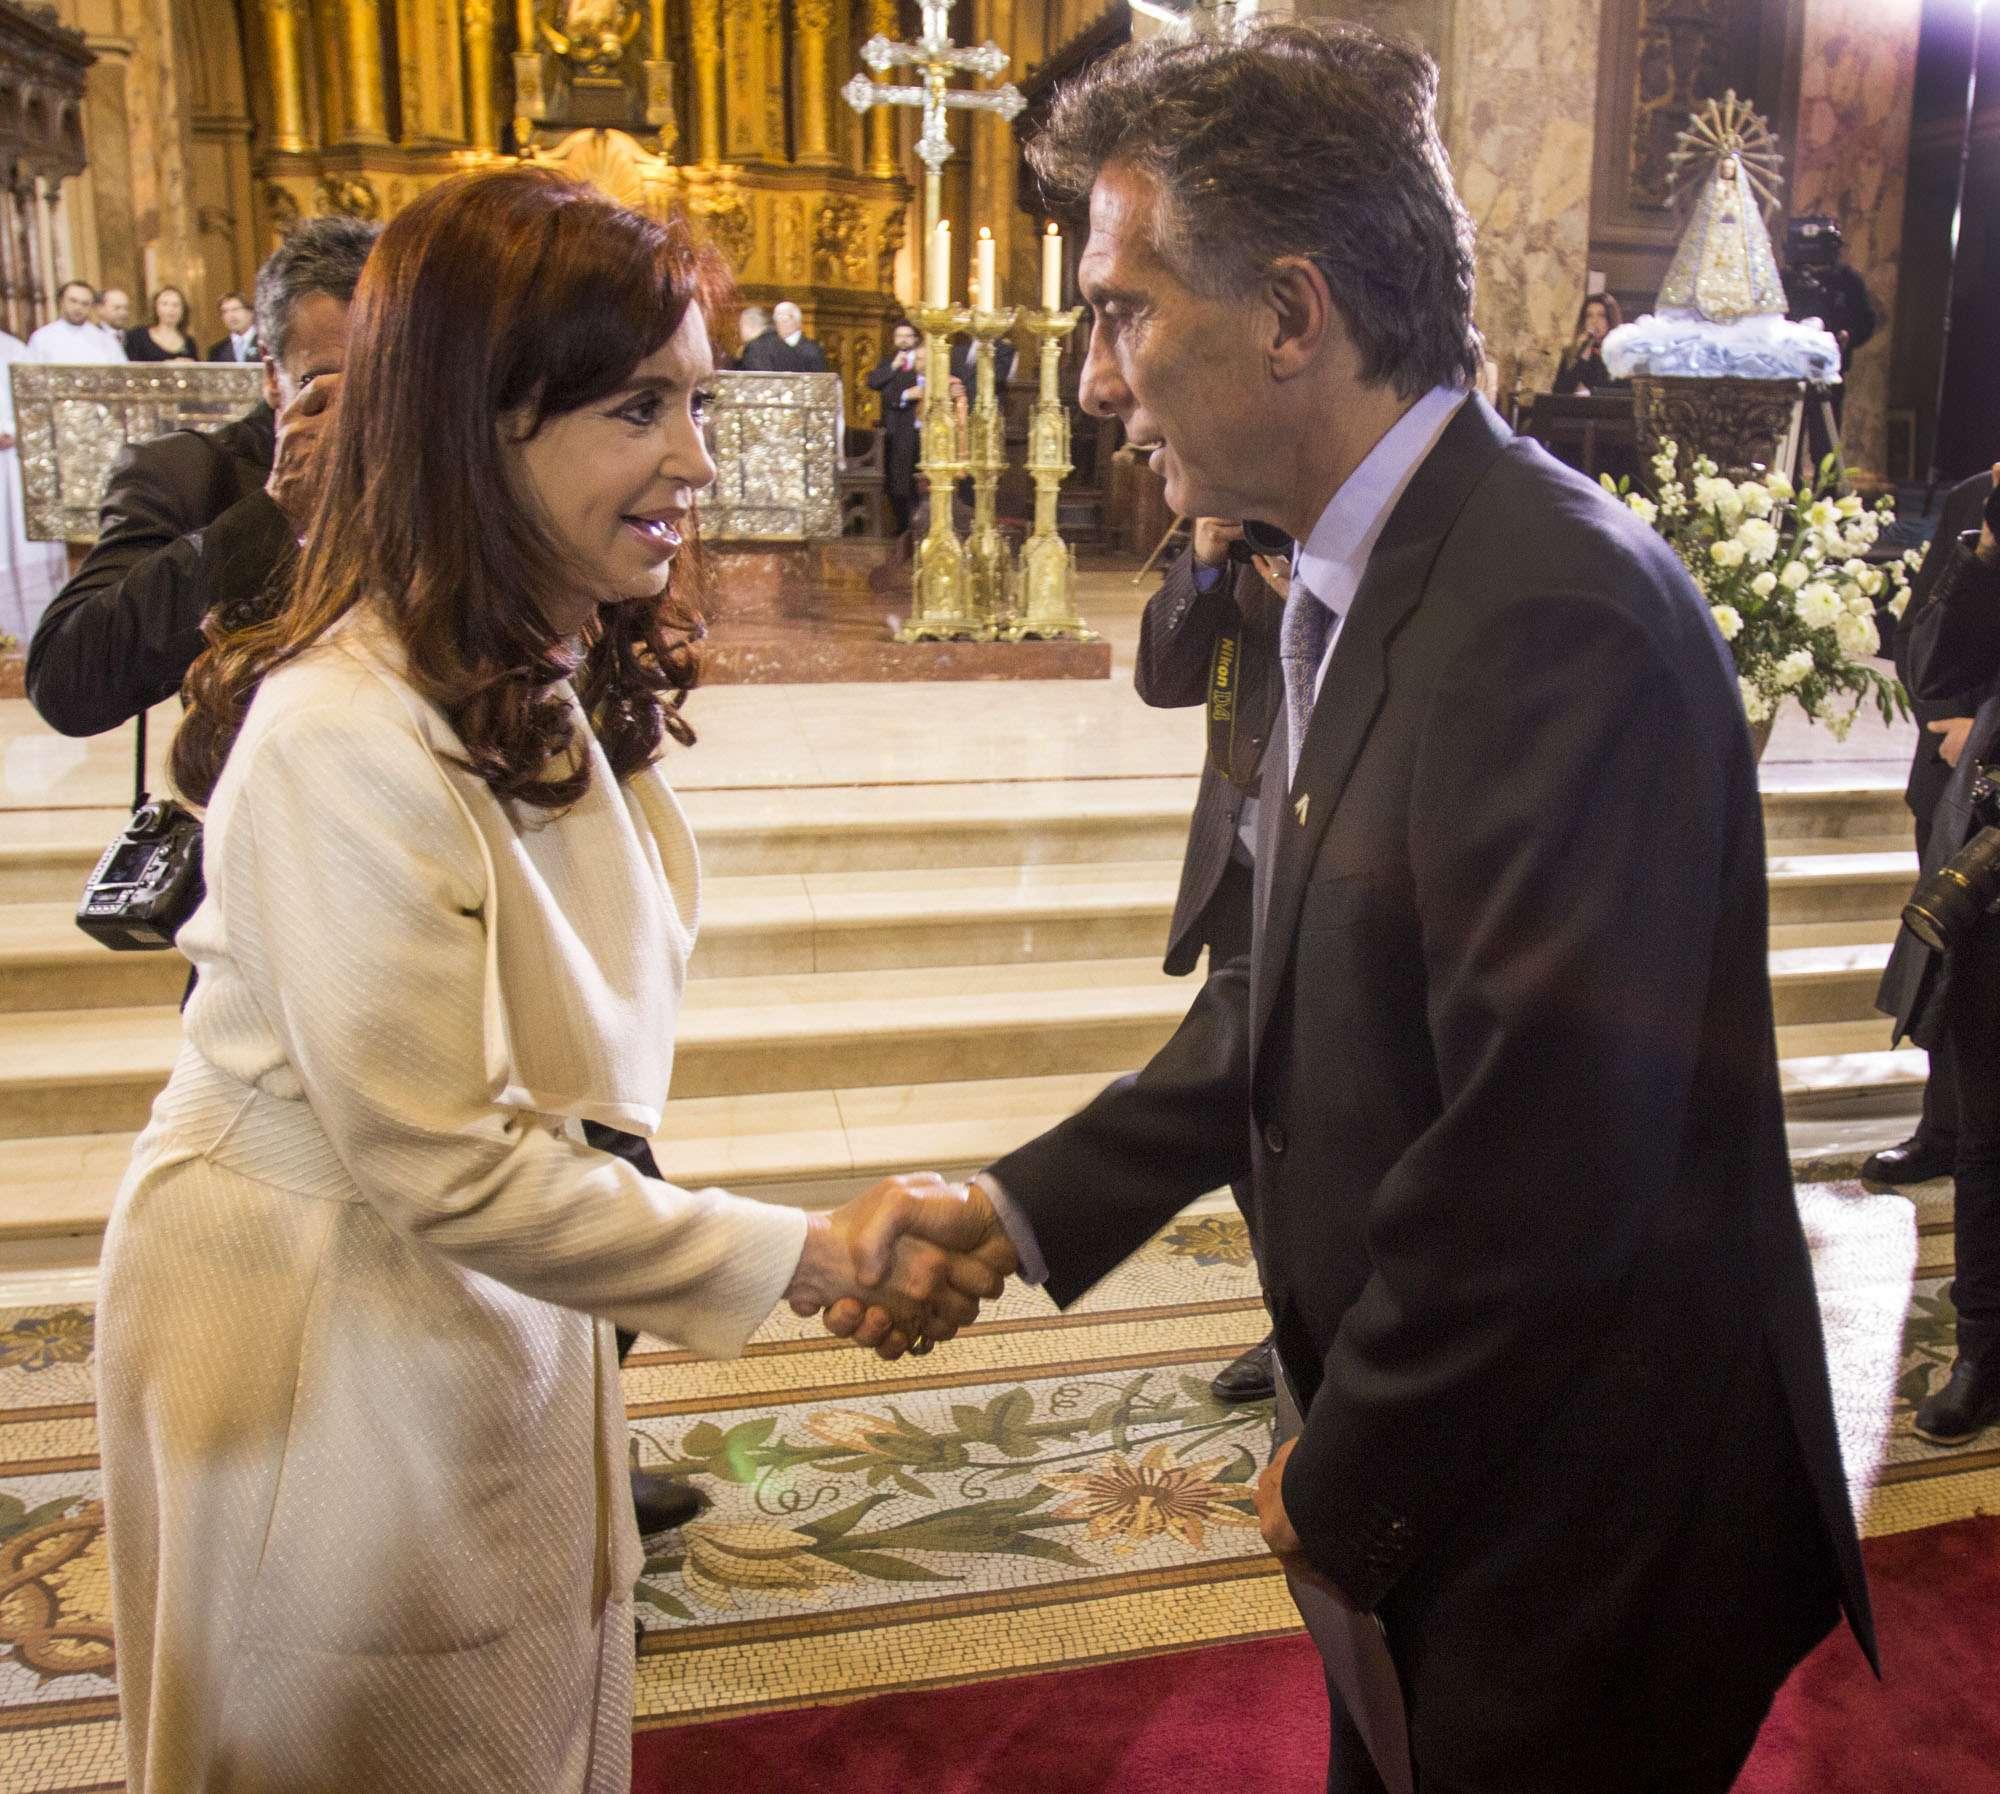 Cristina reaparecerá en público junto a Macri Foto: NA